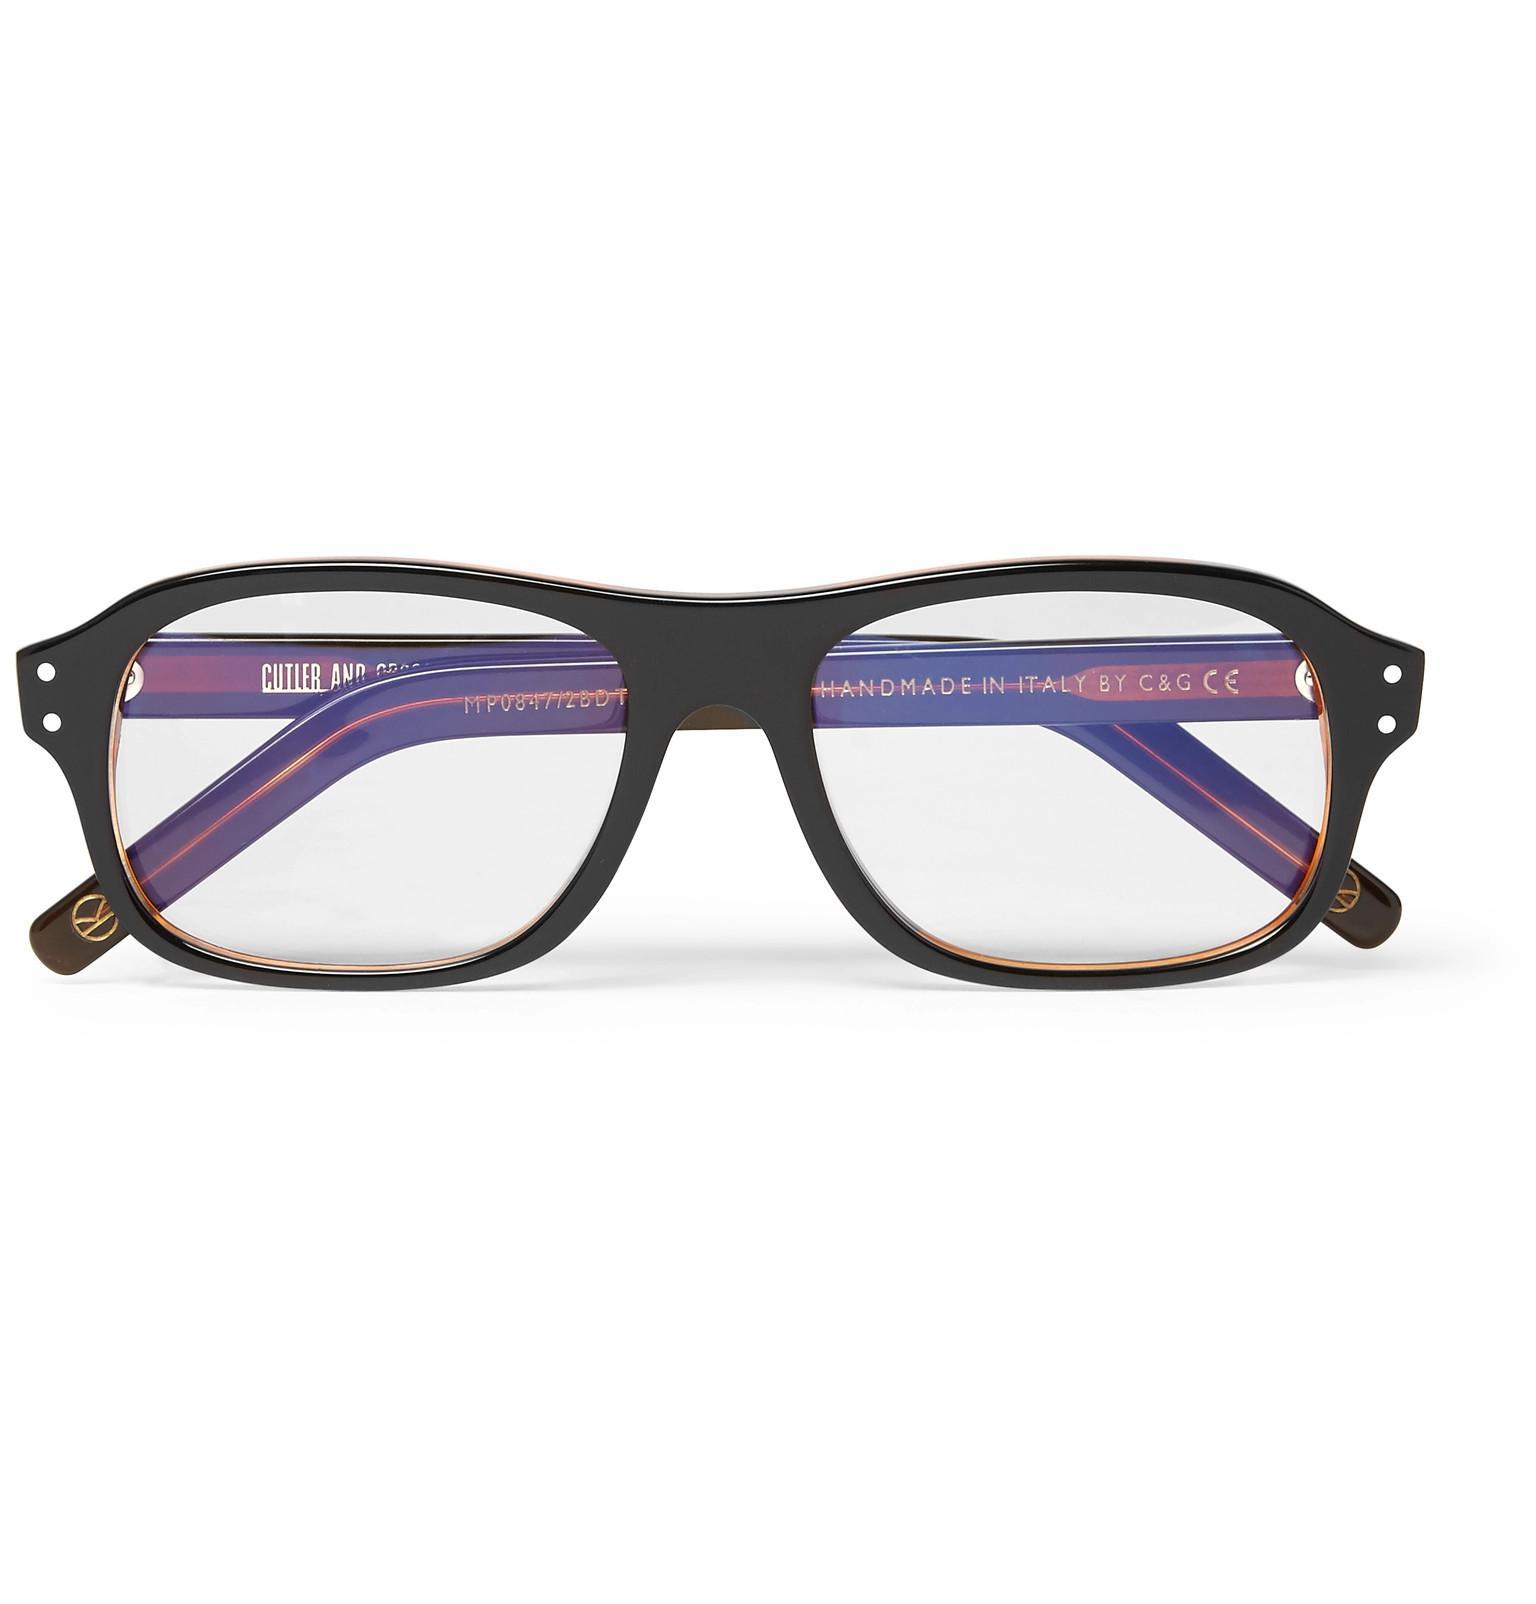 Cutler & Gross square frame sunglasses Cheap Shop Offer wifPd4rbs